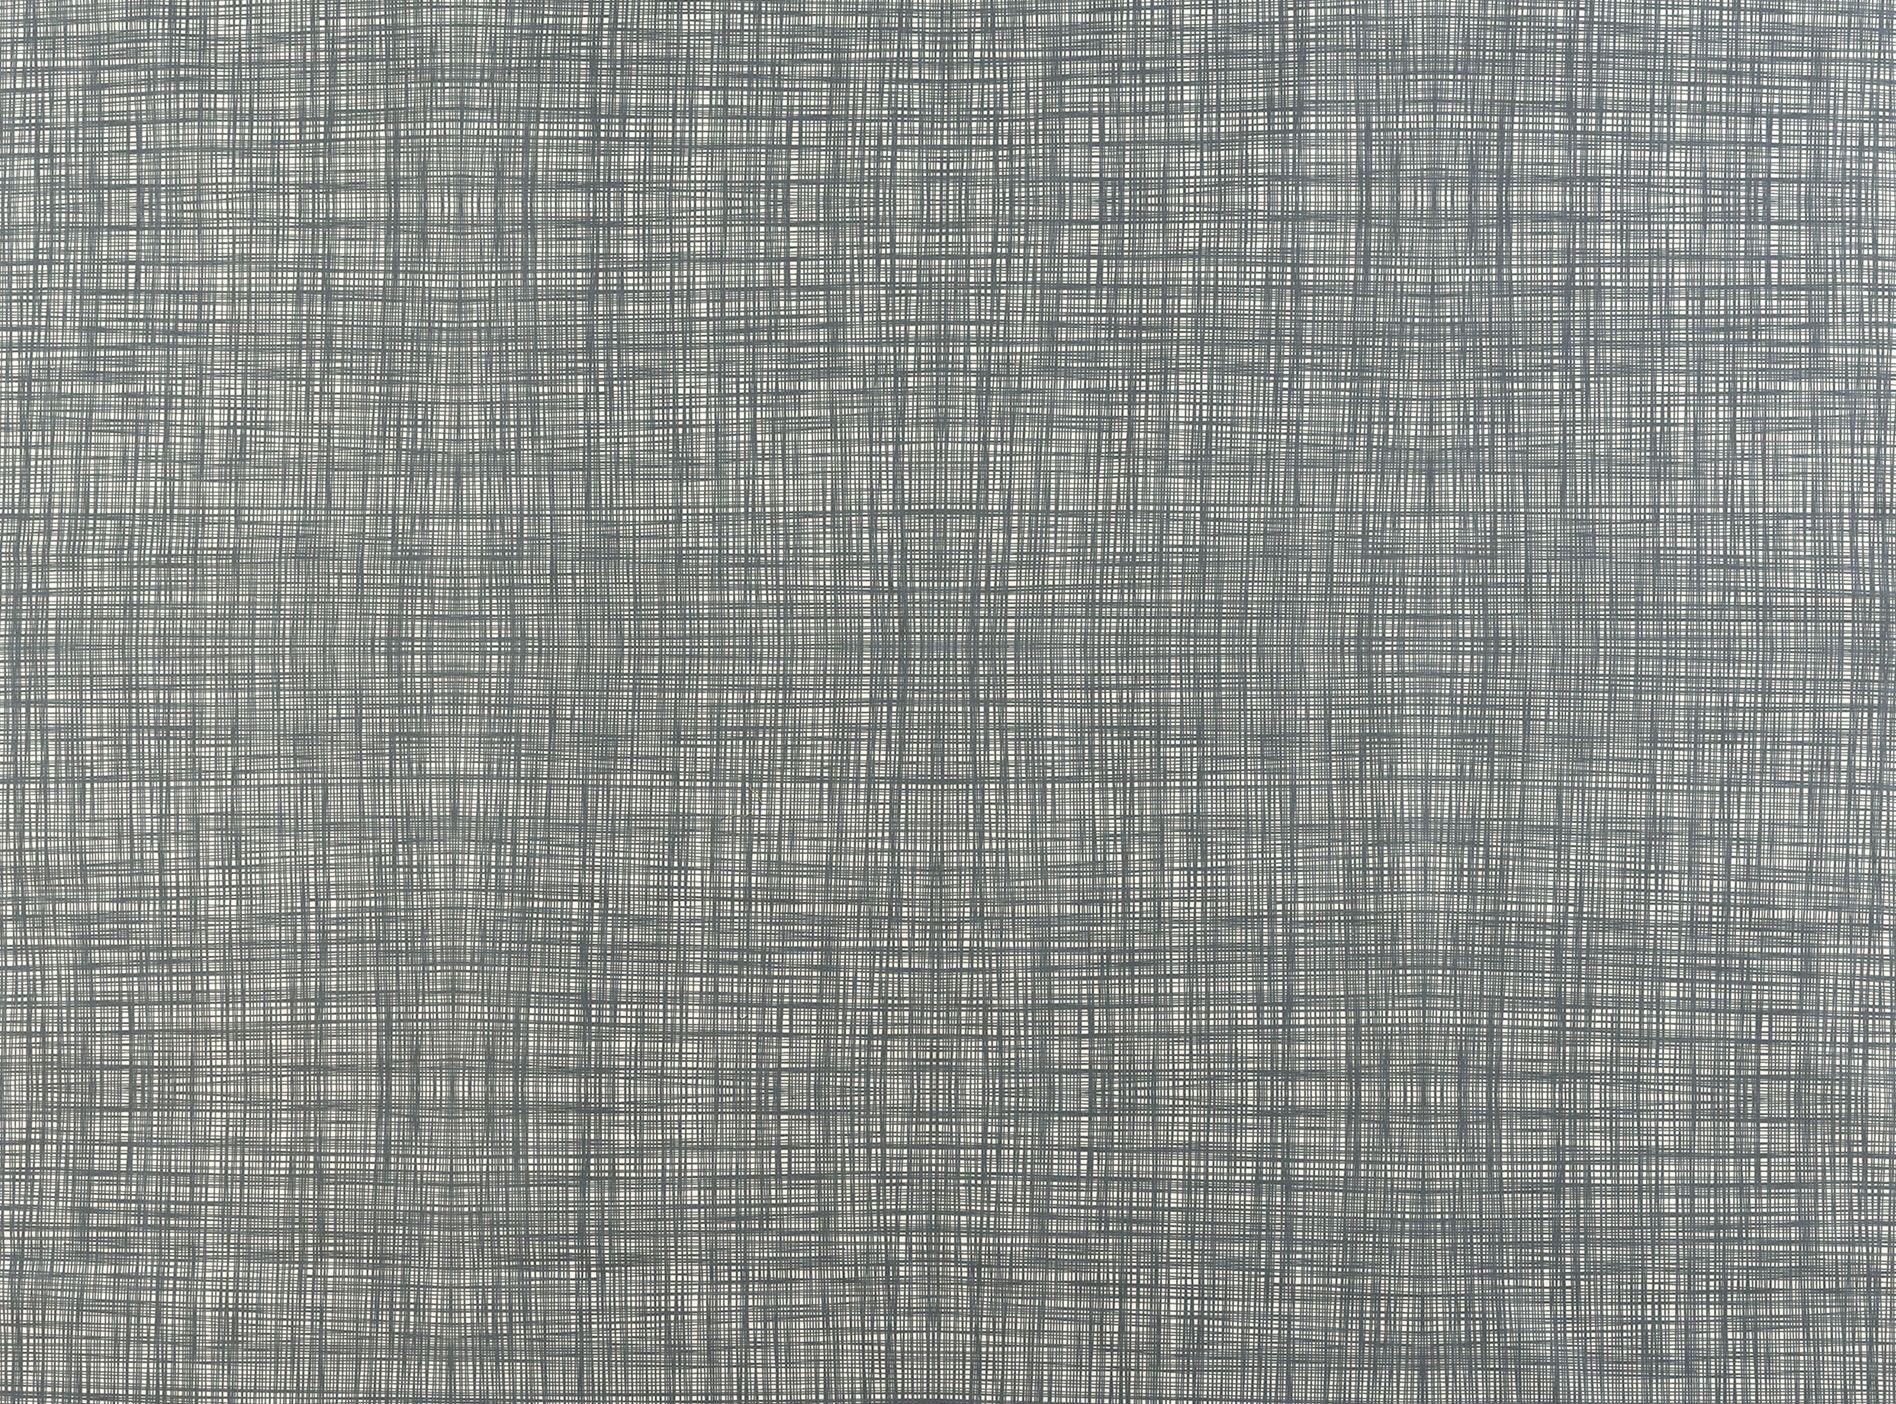 ORLA KIELY Scribble Grey fabric, Fabric, Mid century